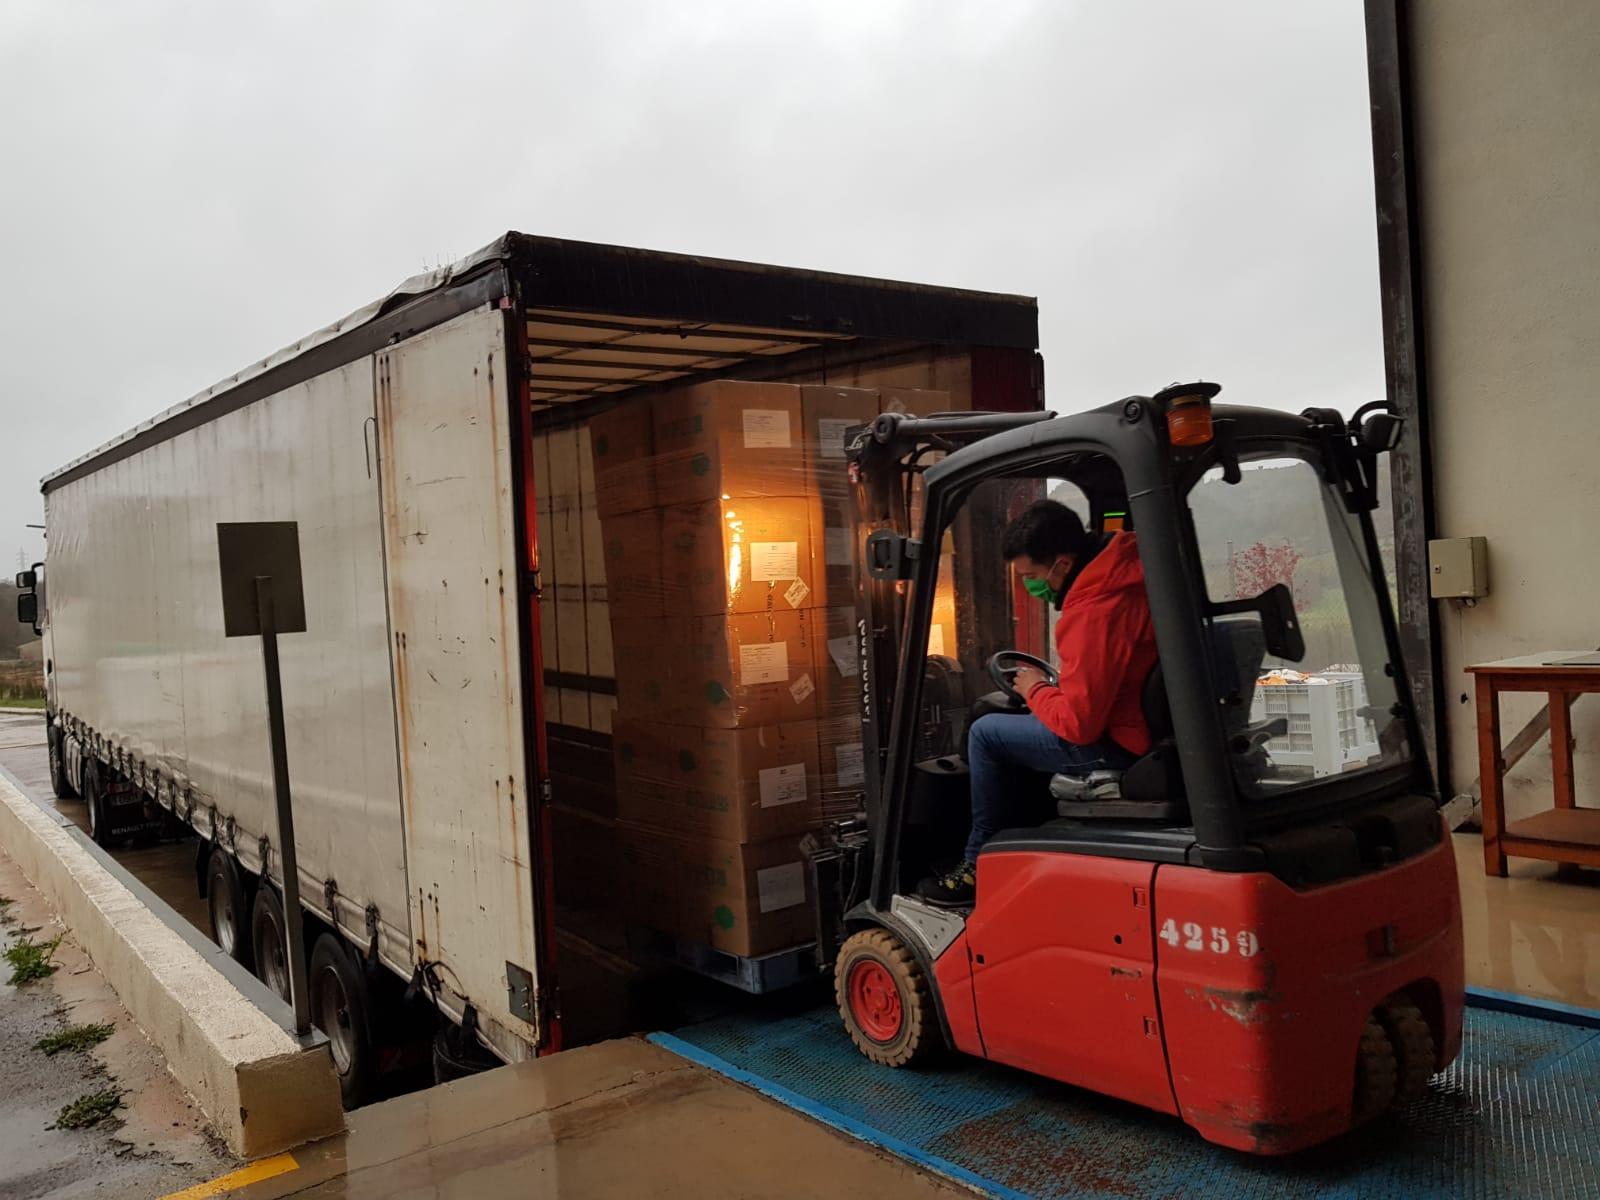 La Diputación de Castellón recibe 28.000 mascarillas procedentes de China